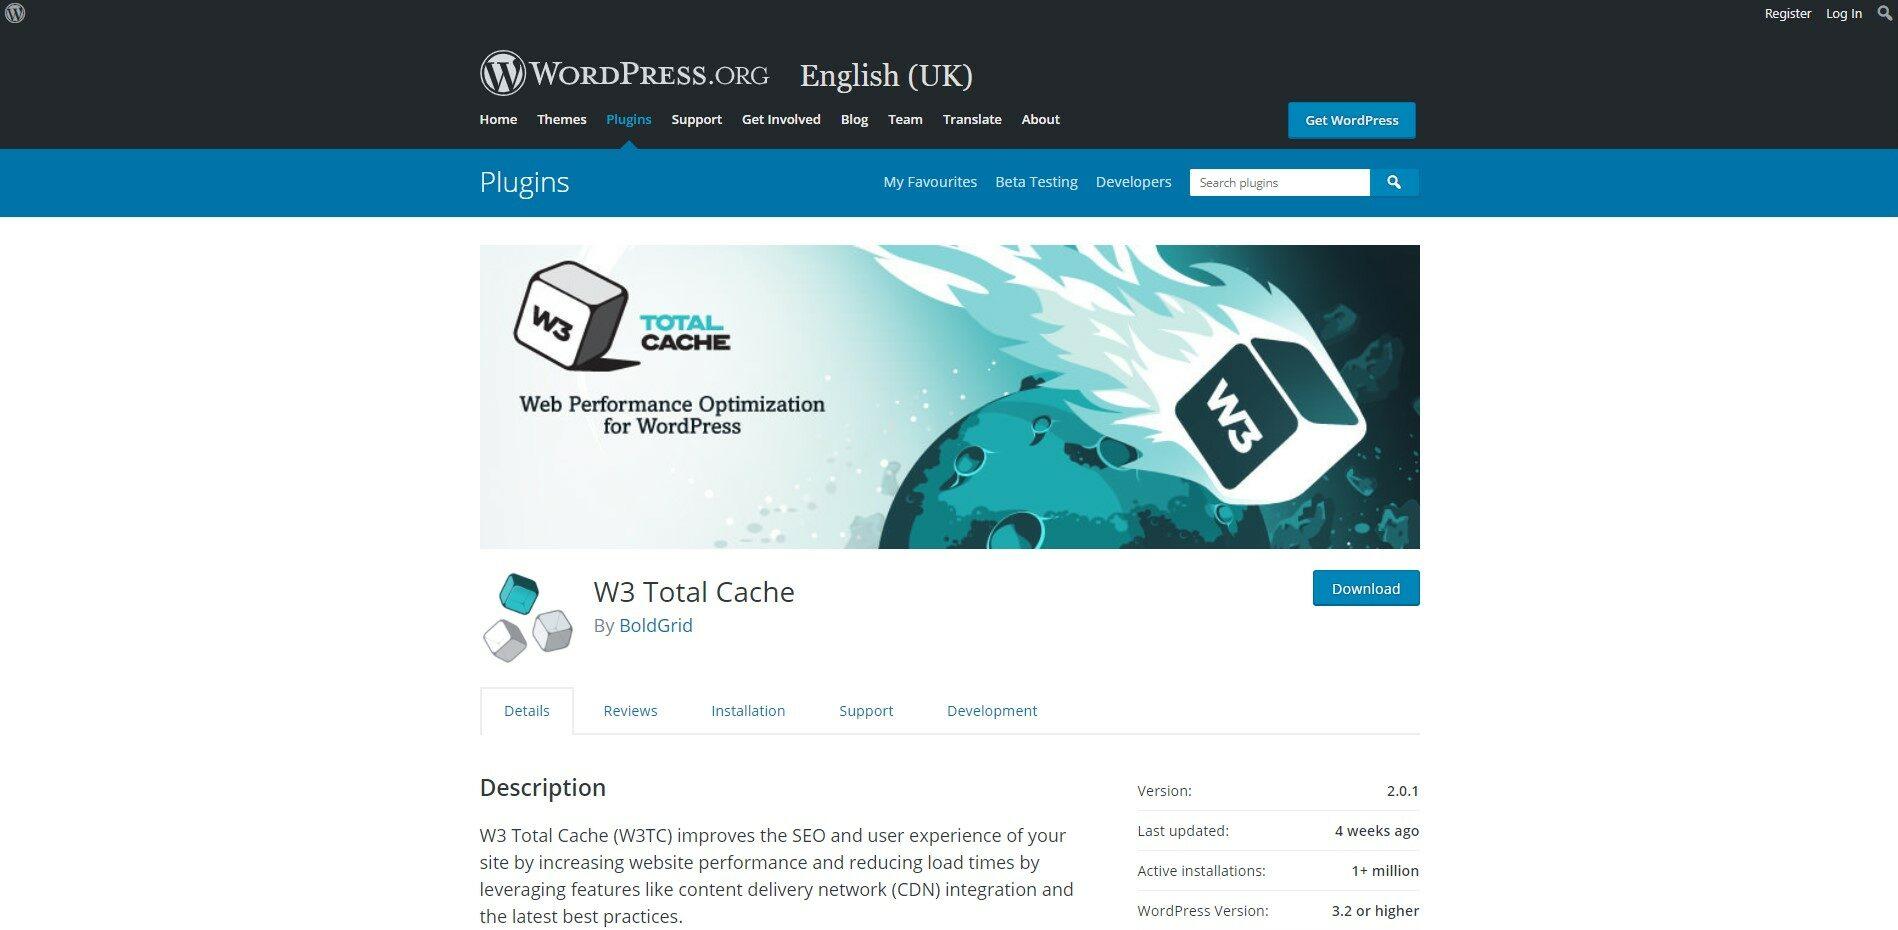 Screenshot of W3 Total Cache Plugin Page